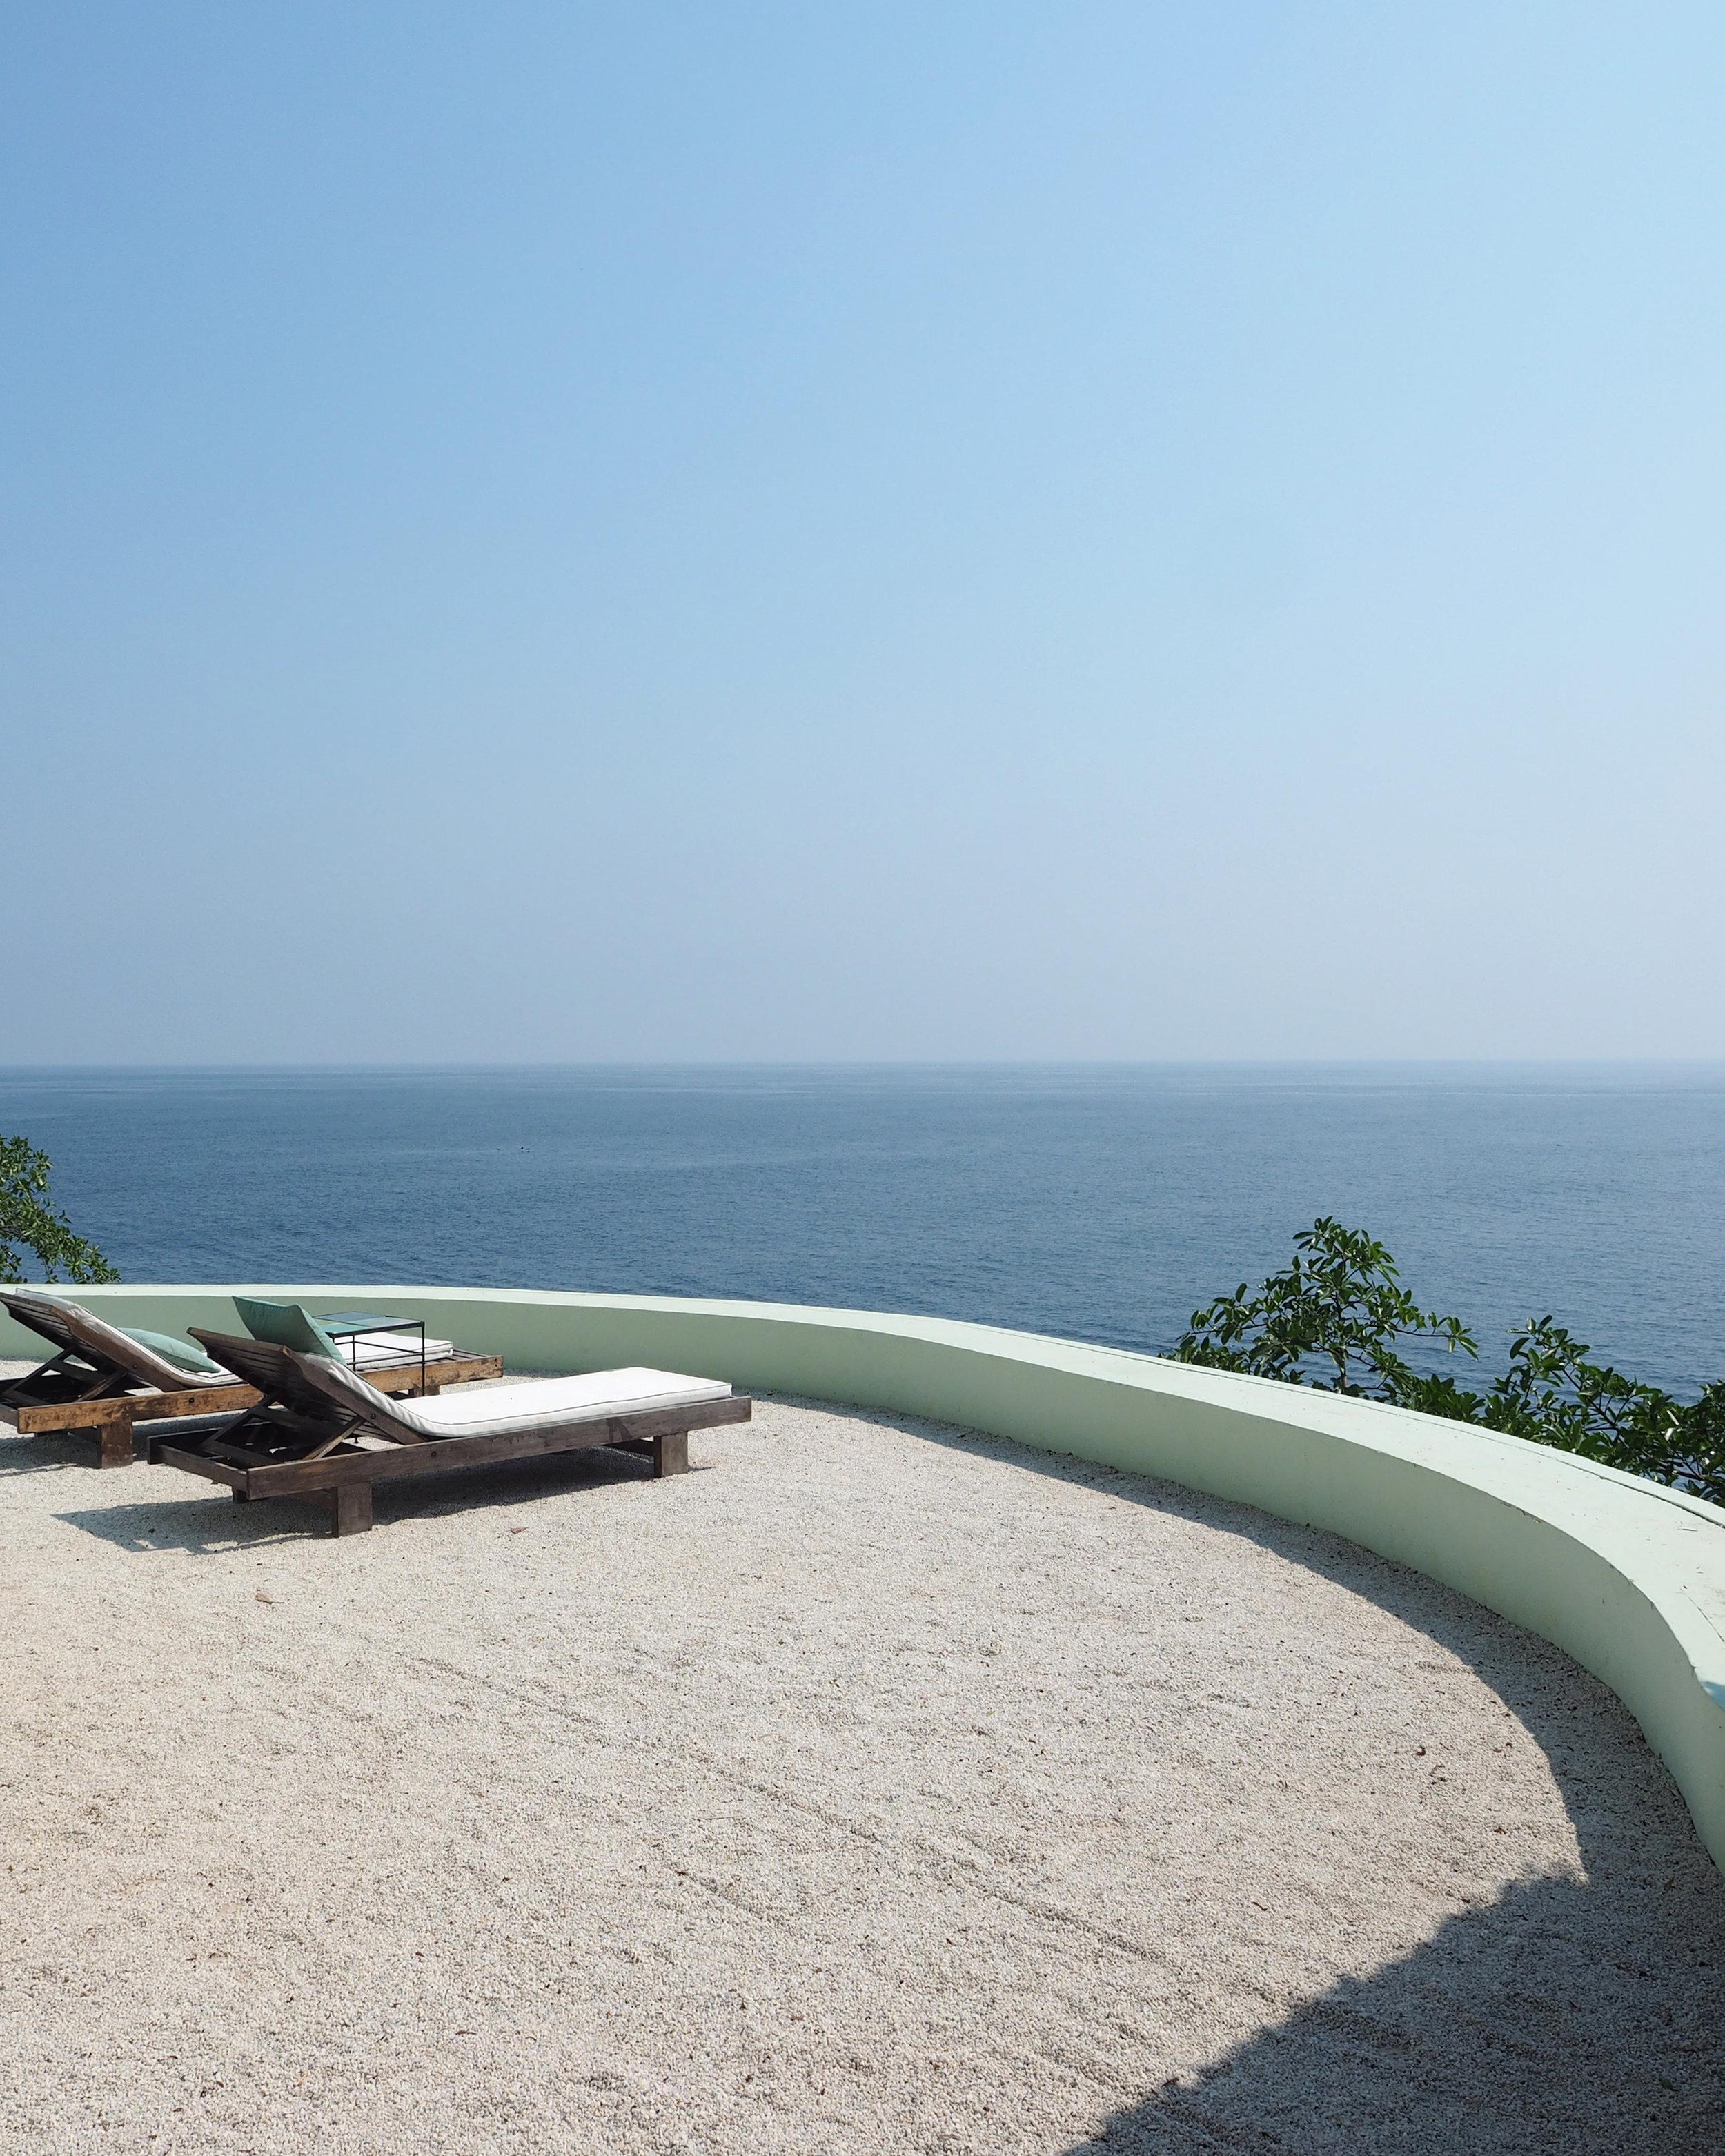 Verana seaview